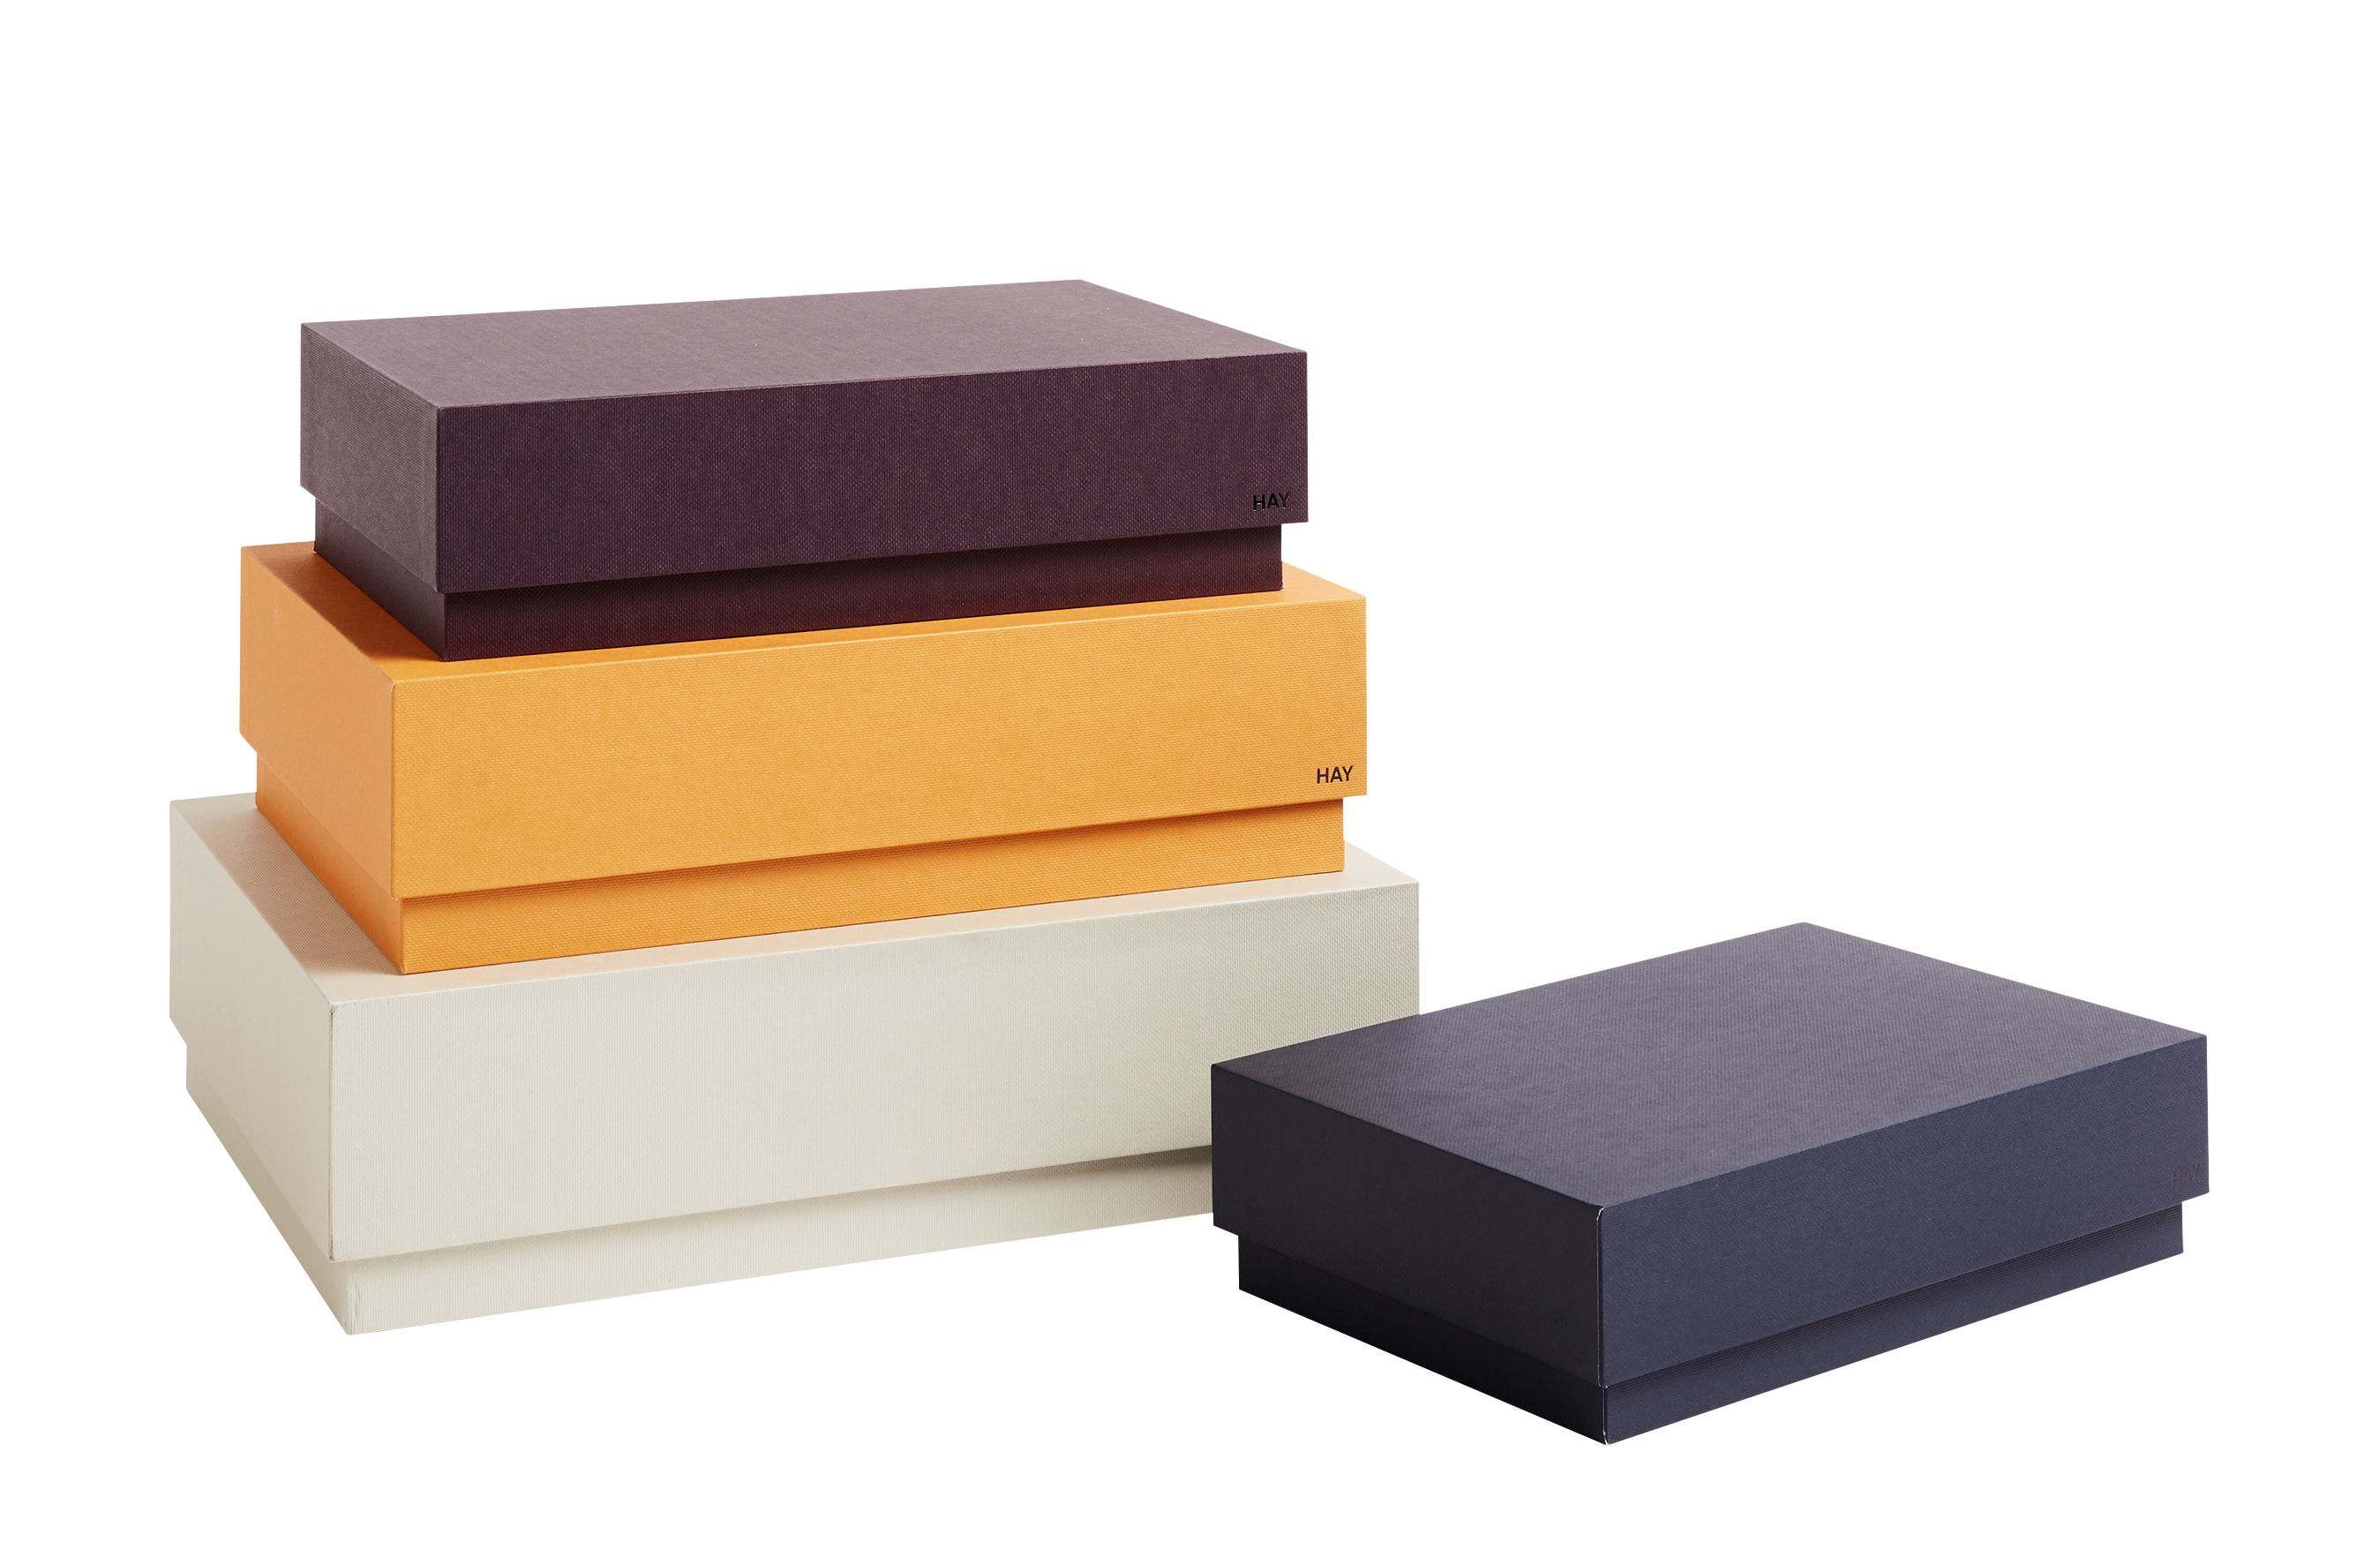 Déco - Boîtes déco - Boîte Desktop / Set de 4 - L 32 cm - Hay - Multicolore - Carton